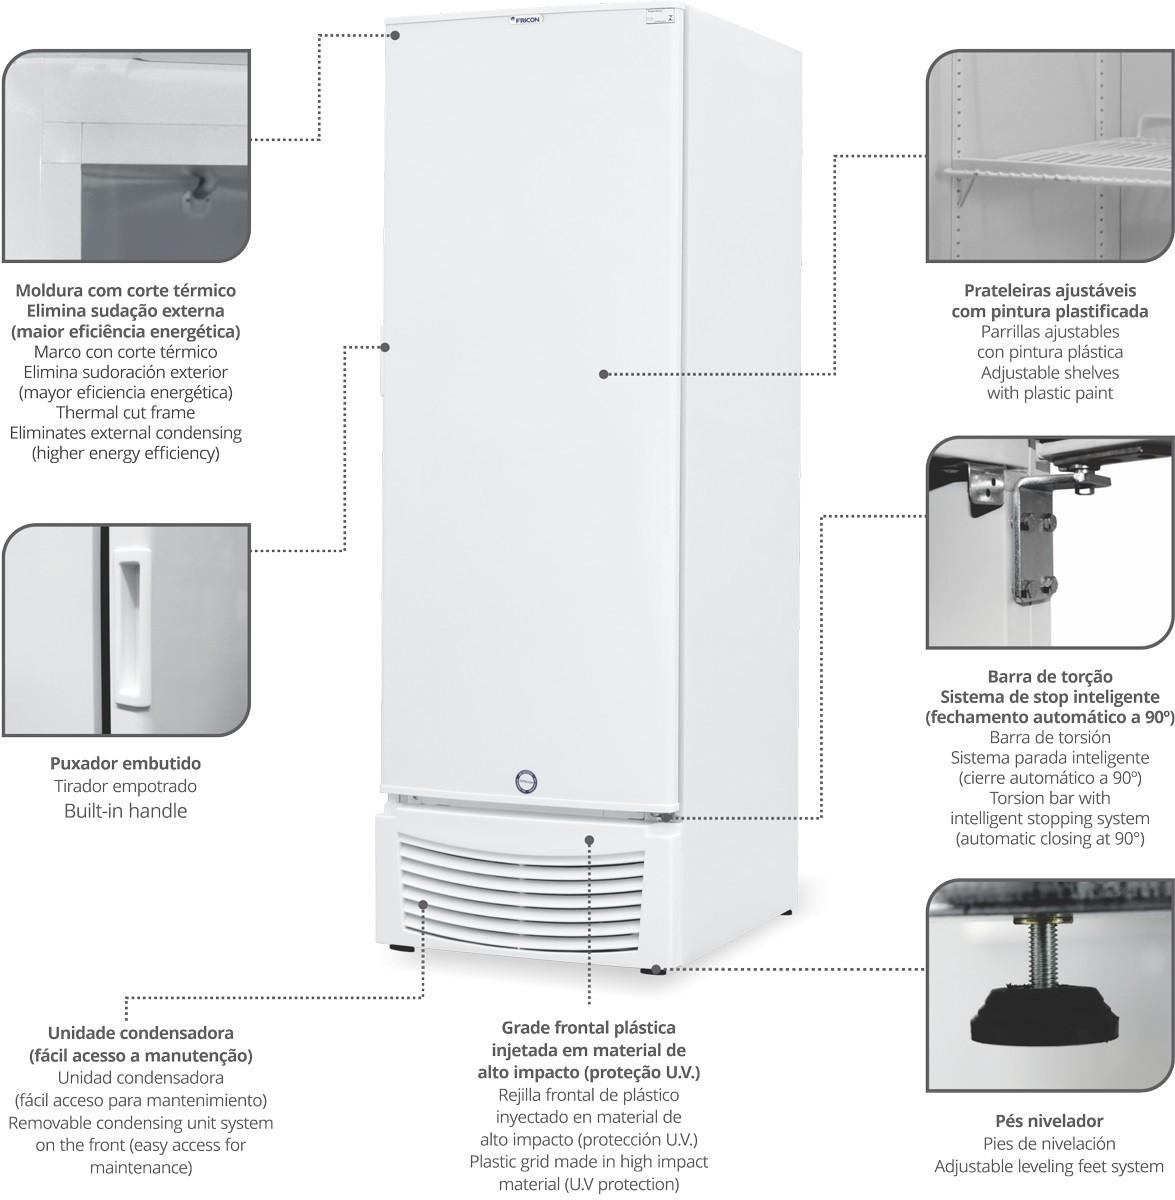 Conservador freezer Congelados VCED569 Preto Porta Cega - Fricon